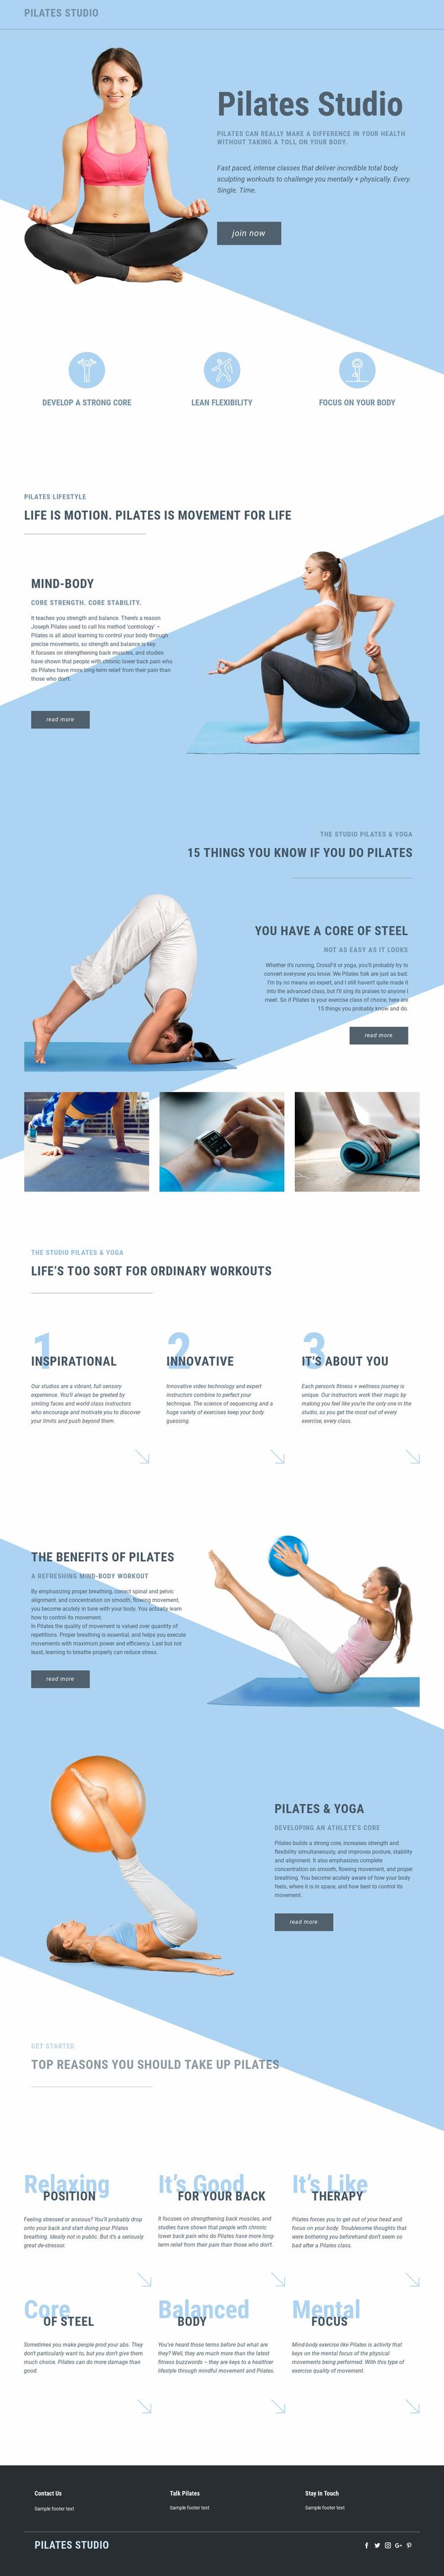 Pilates studio and sports Web Page Designer